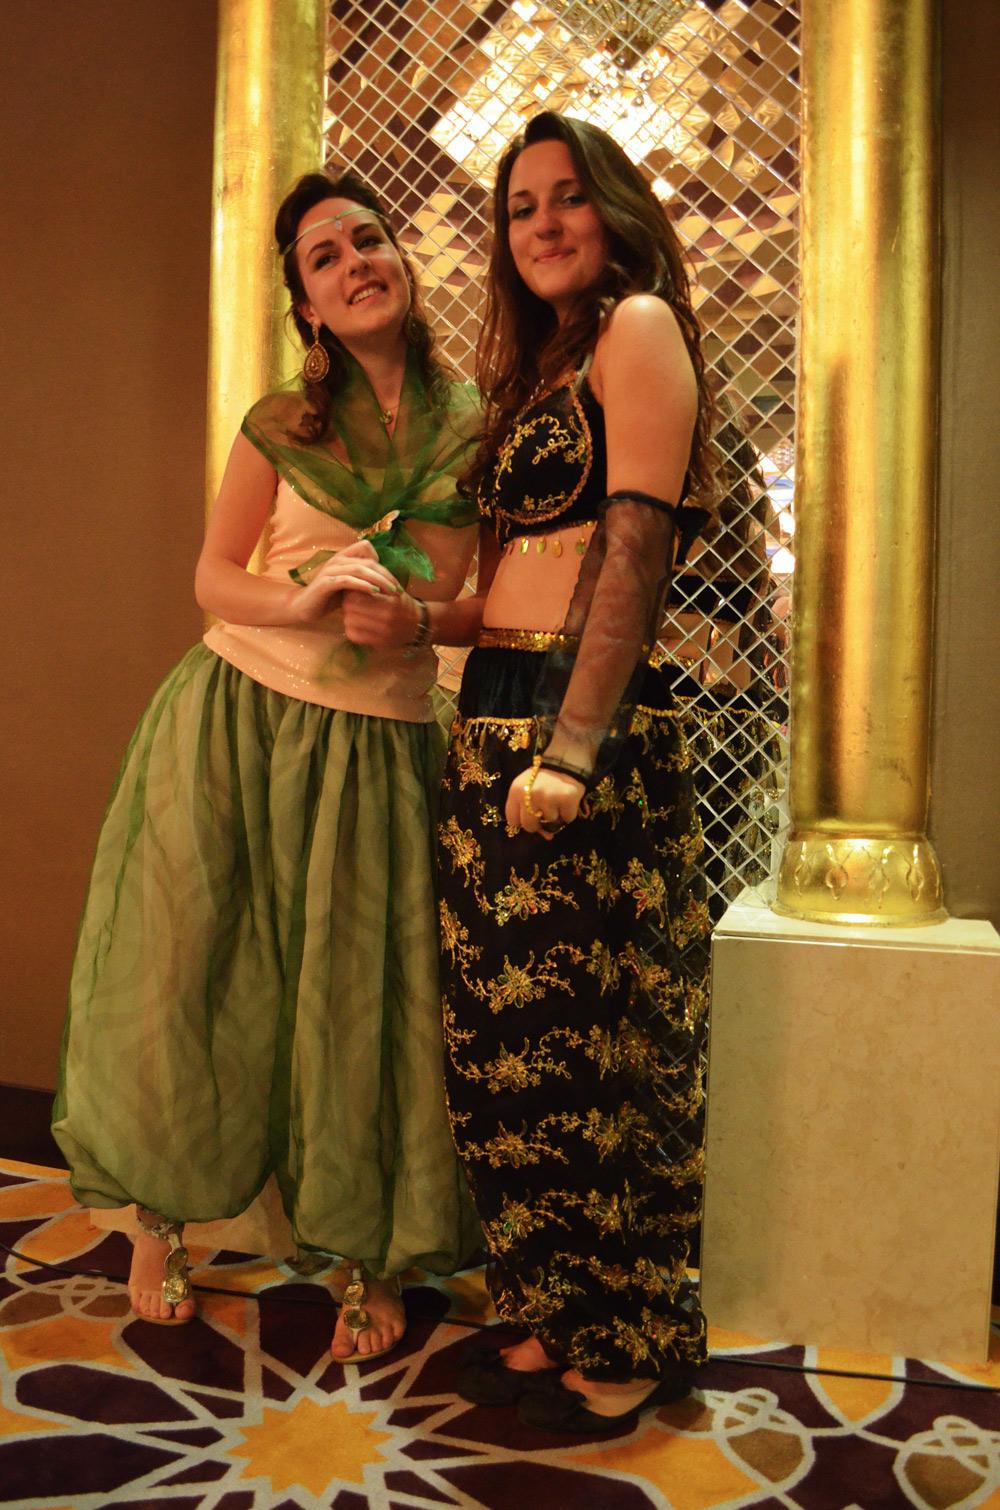 dasynka-turkey-travel-fashion-blogger-oriental-luxury-hotel